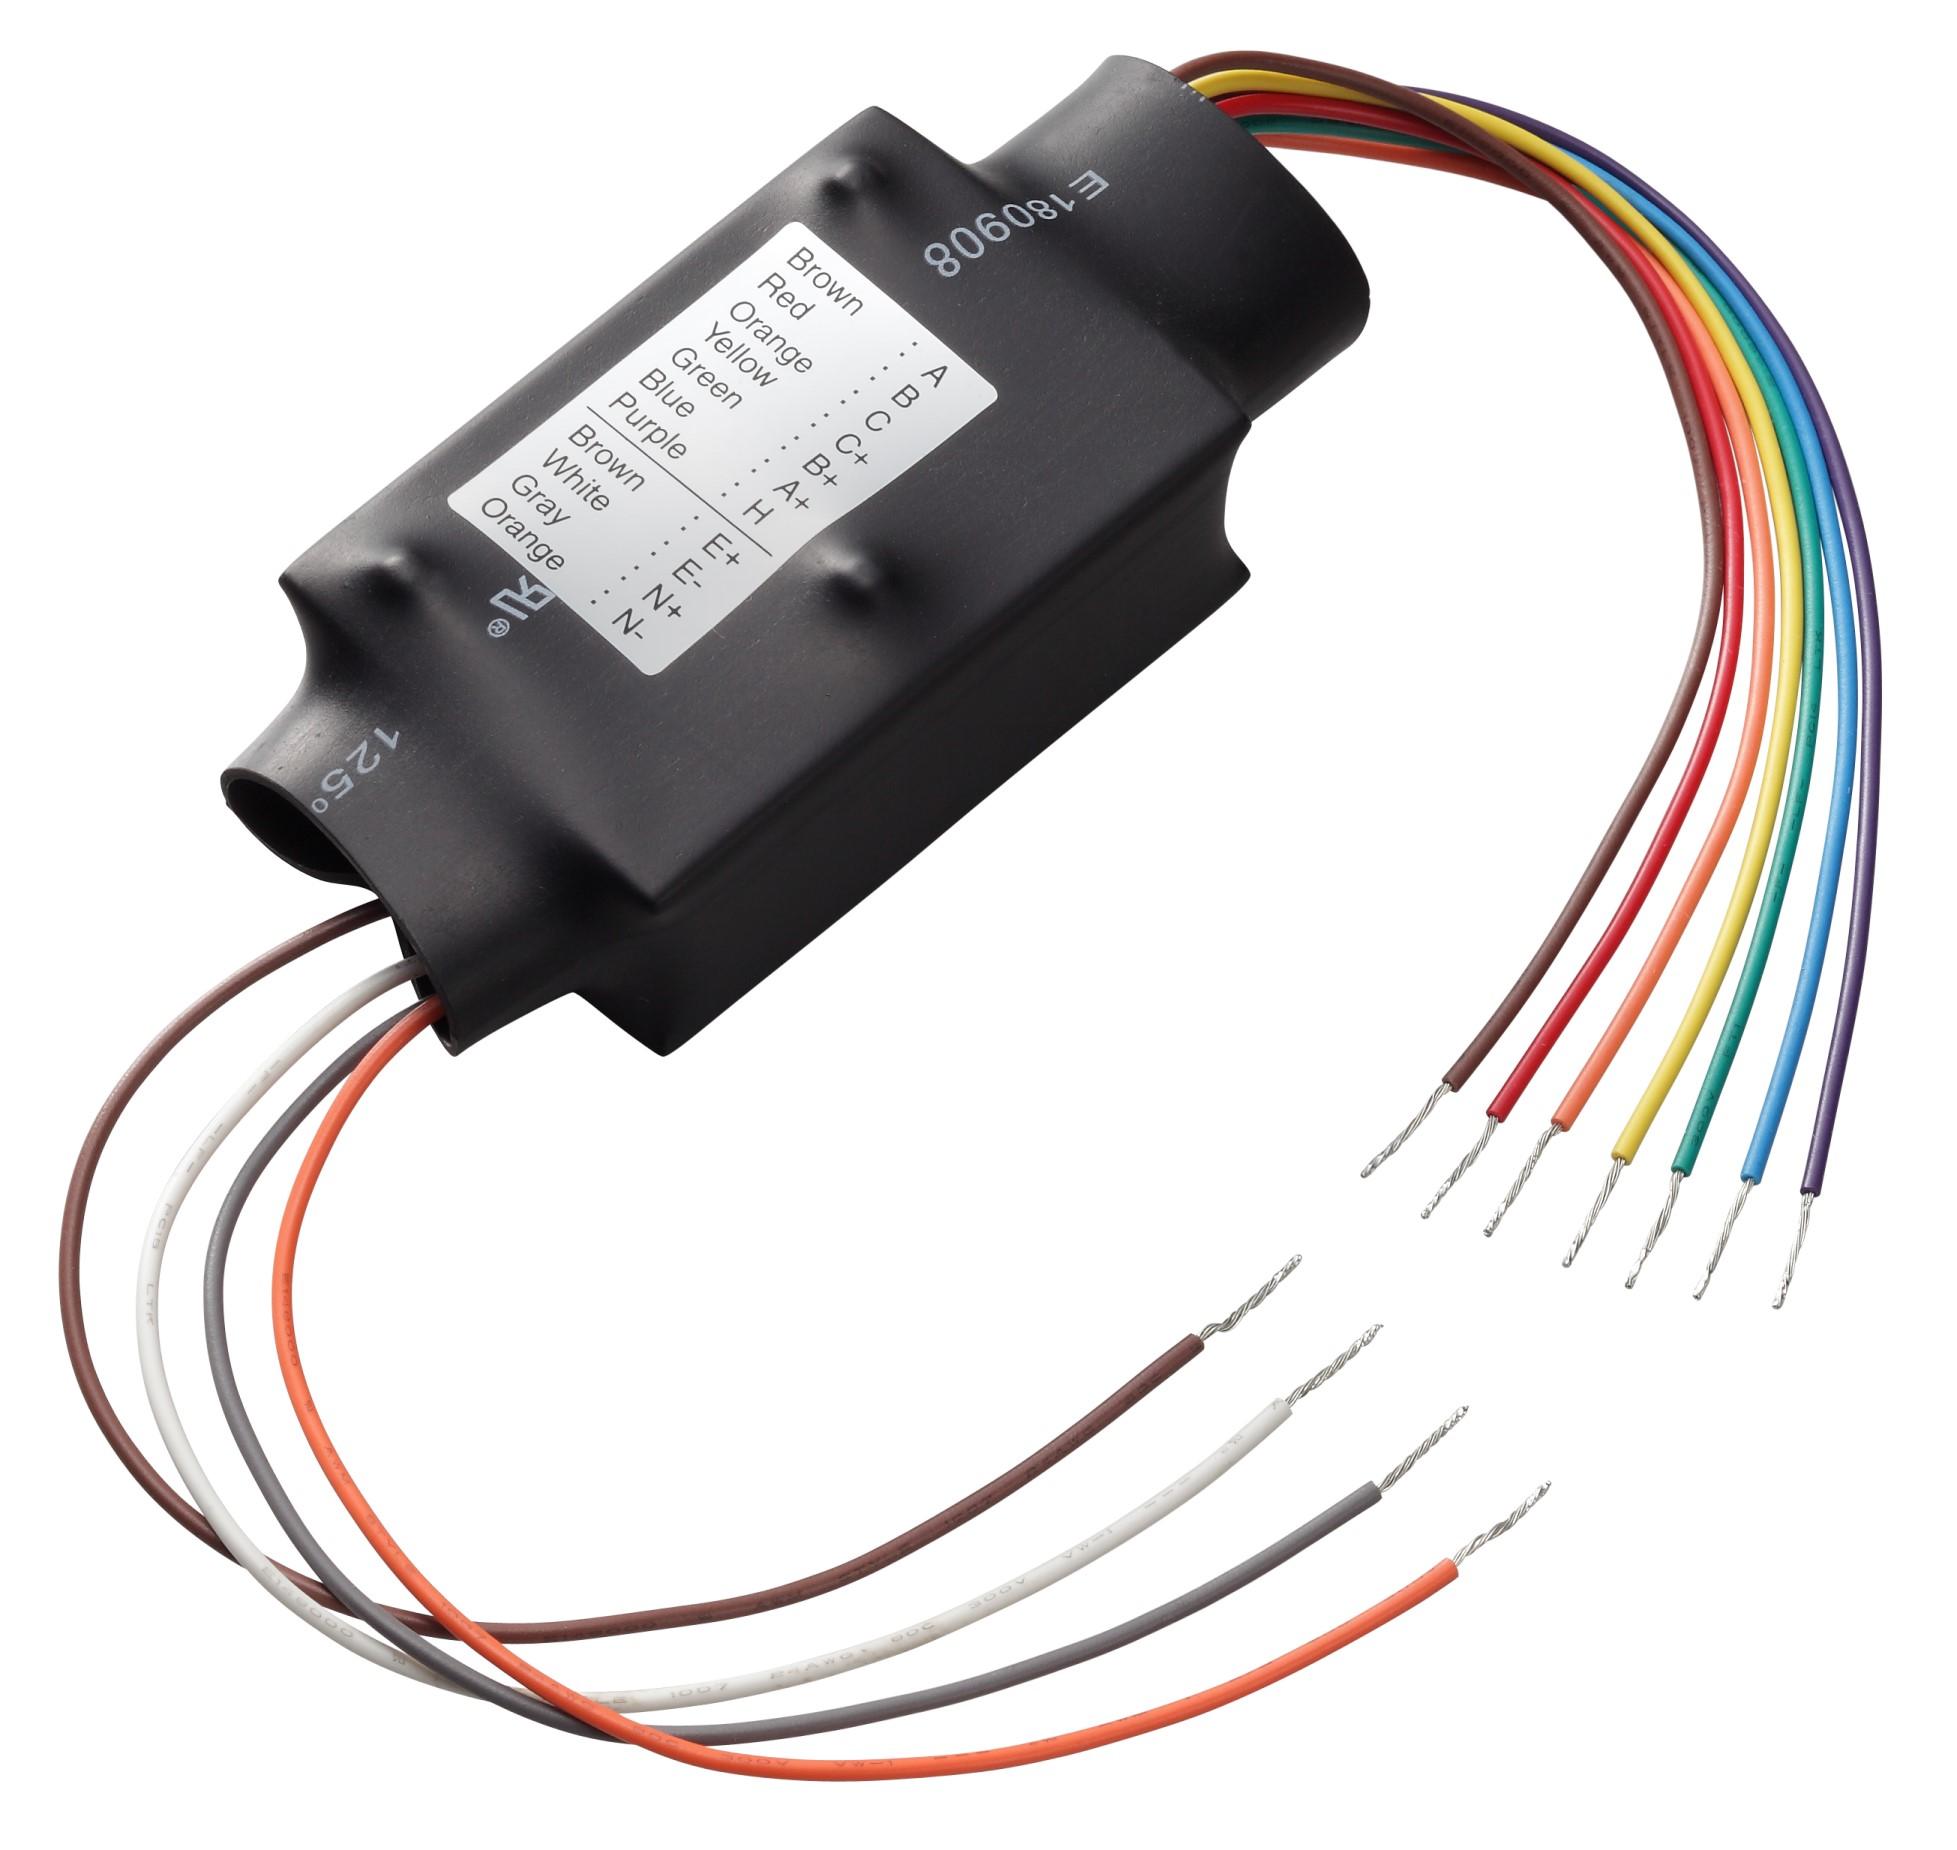 TOA RS-142 Intercom Switch Board on